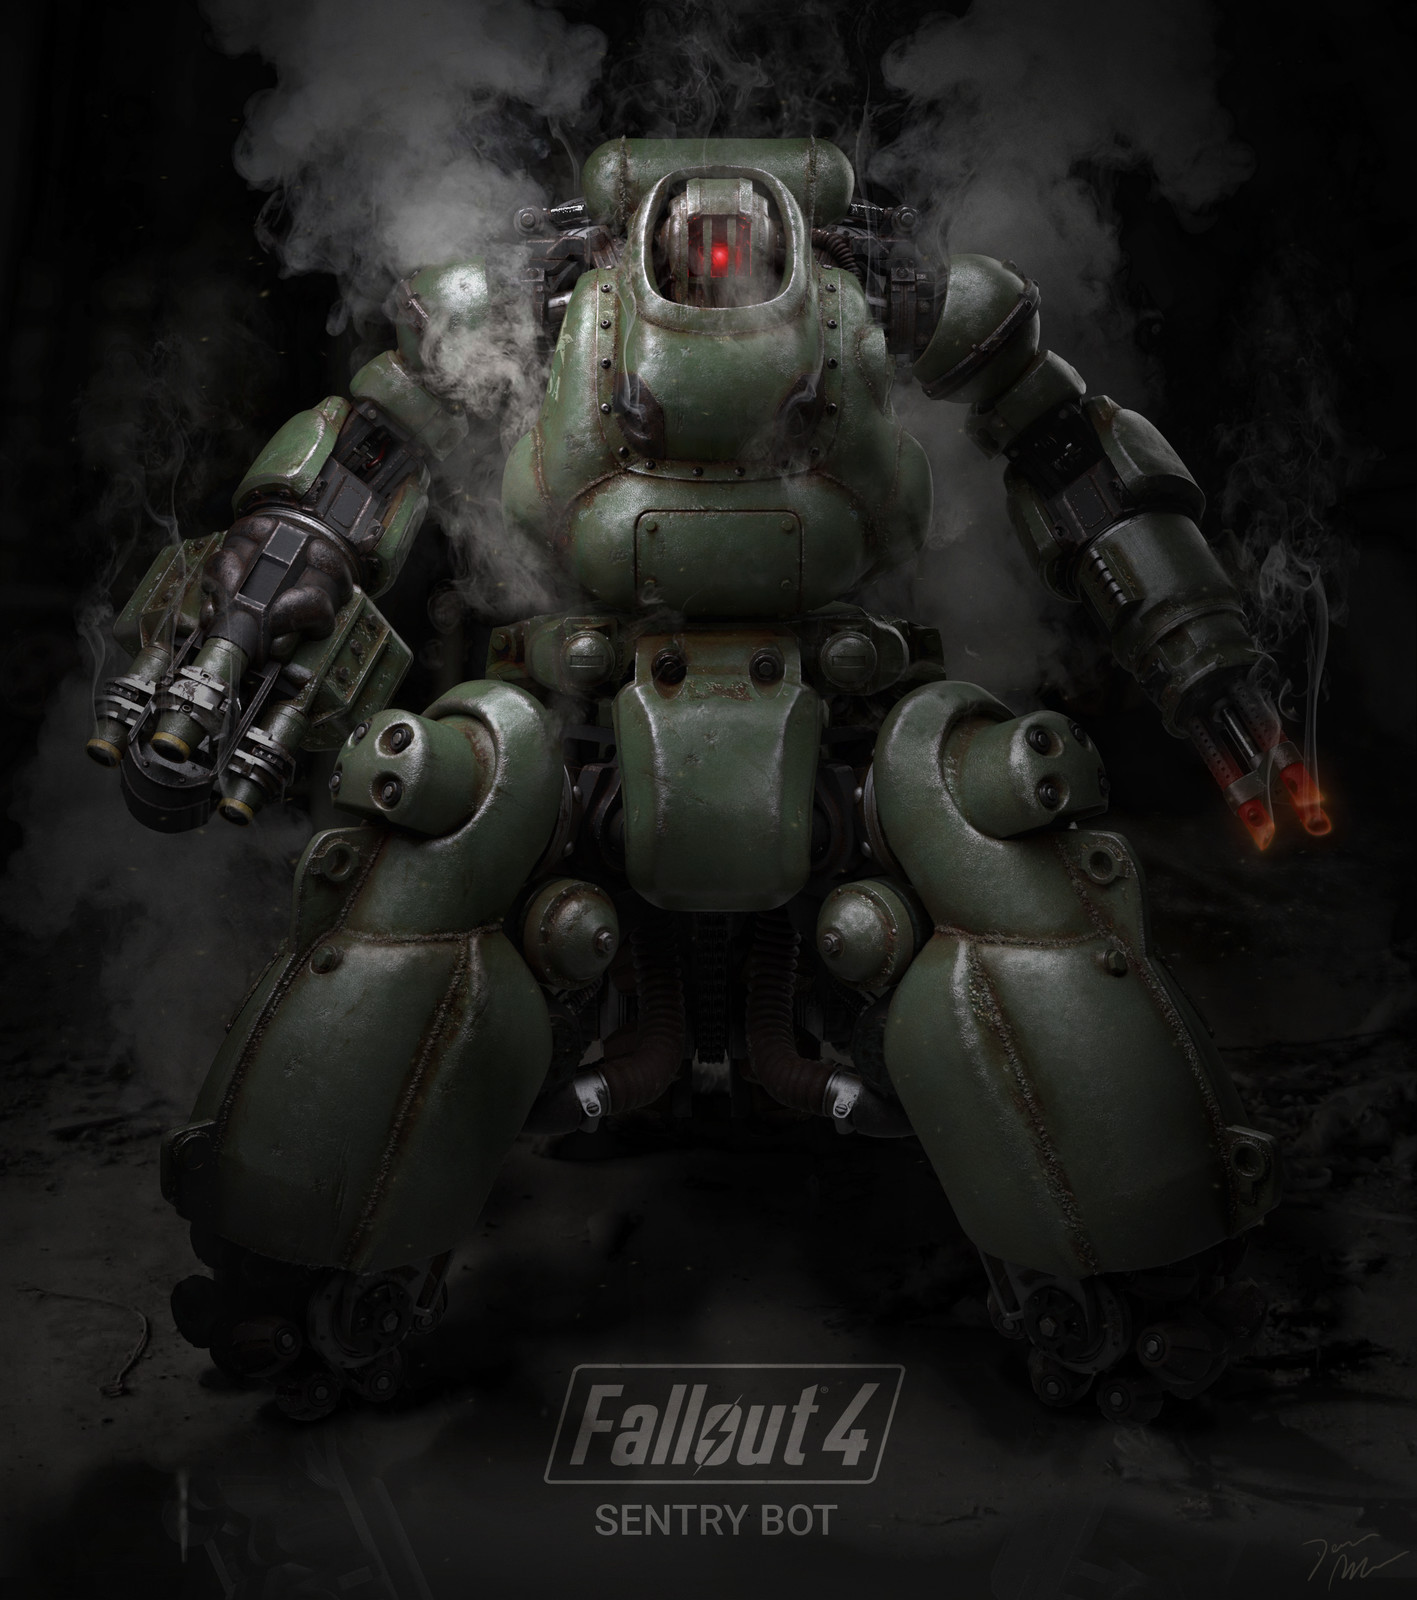 ArtStation - Fallout 4 Sentry Bot Poster 1, Dennis Mejillones